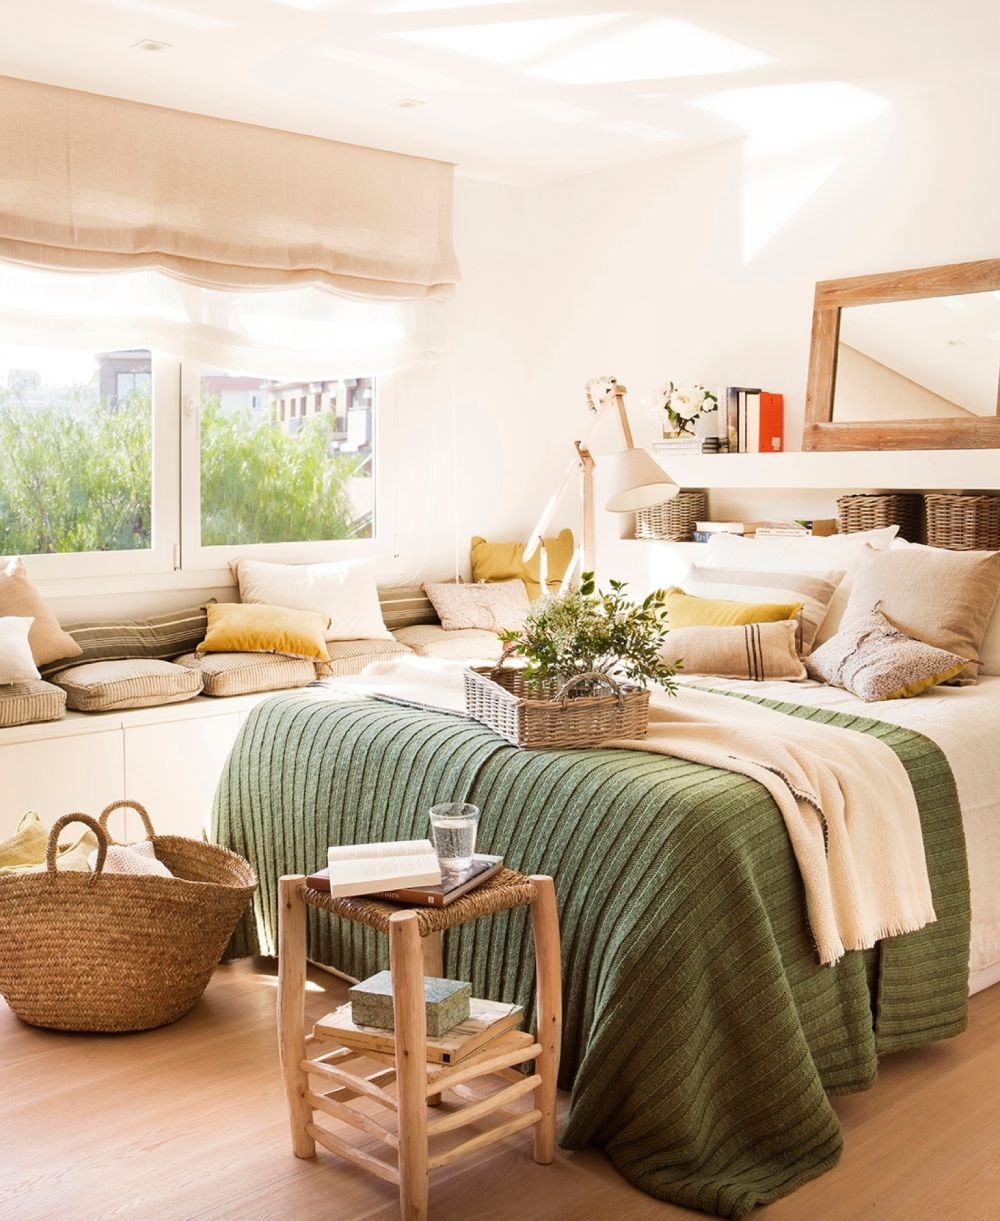 adelaparvu-com-despre-apartament-cald-in-tonuri-neutre-locuinta-spania-design-interior-laura-argelich-si-carla-casanova-foto-jordi-canosa-elmueble-9